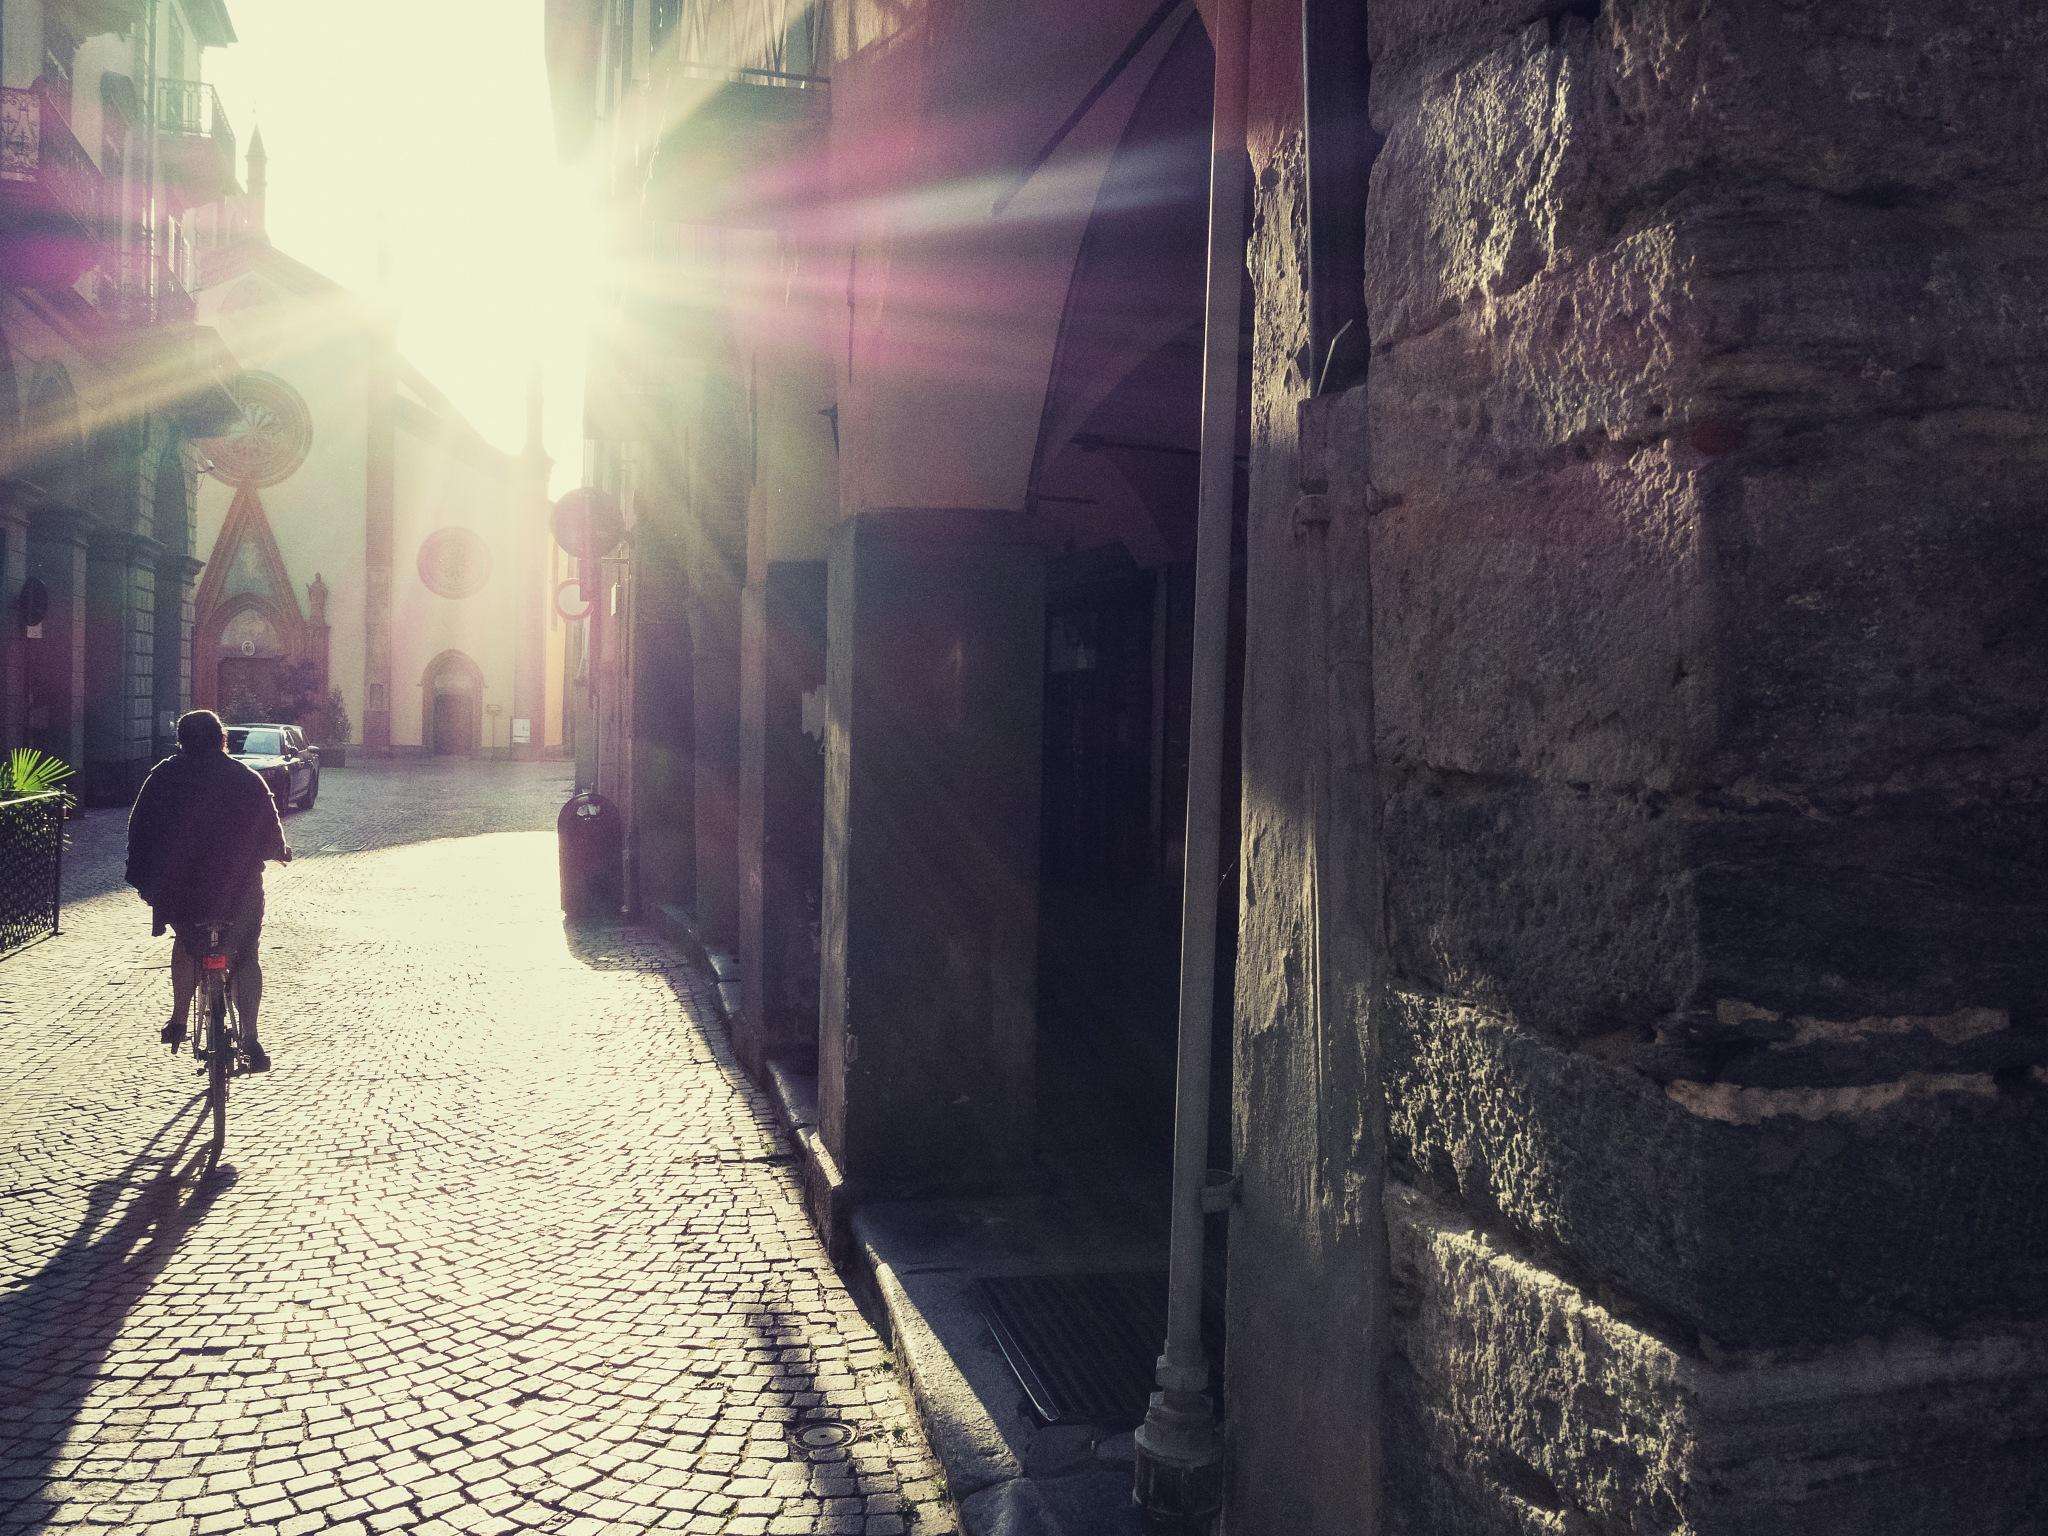 Early morning by Giuseppe Petenzi